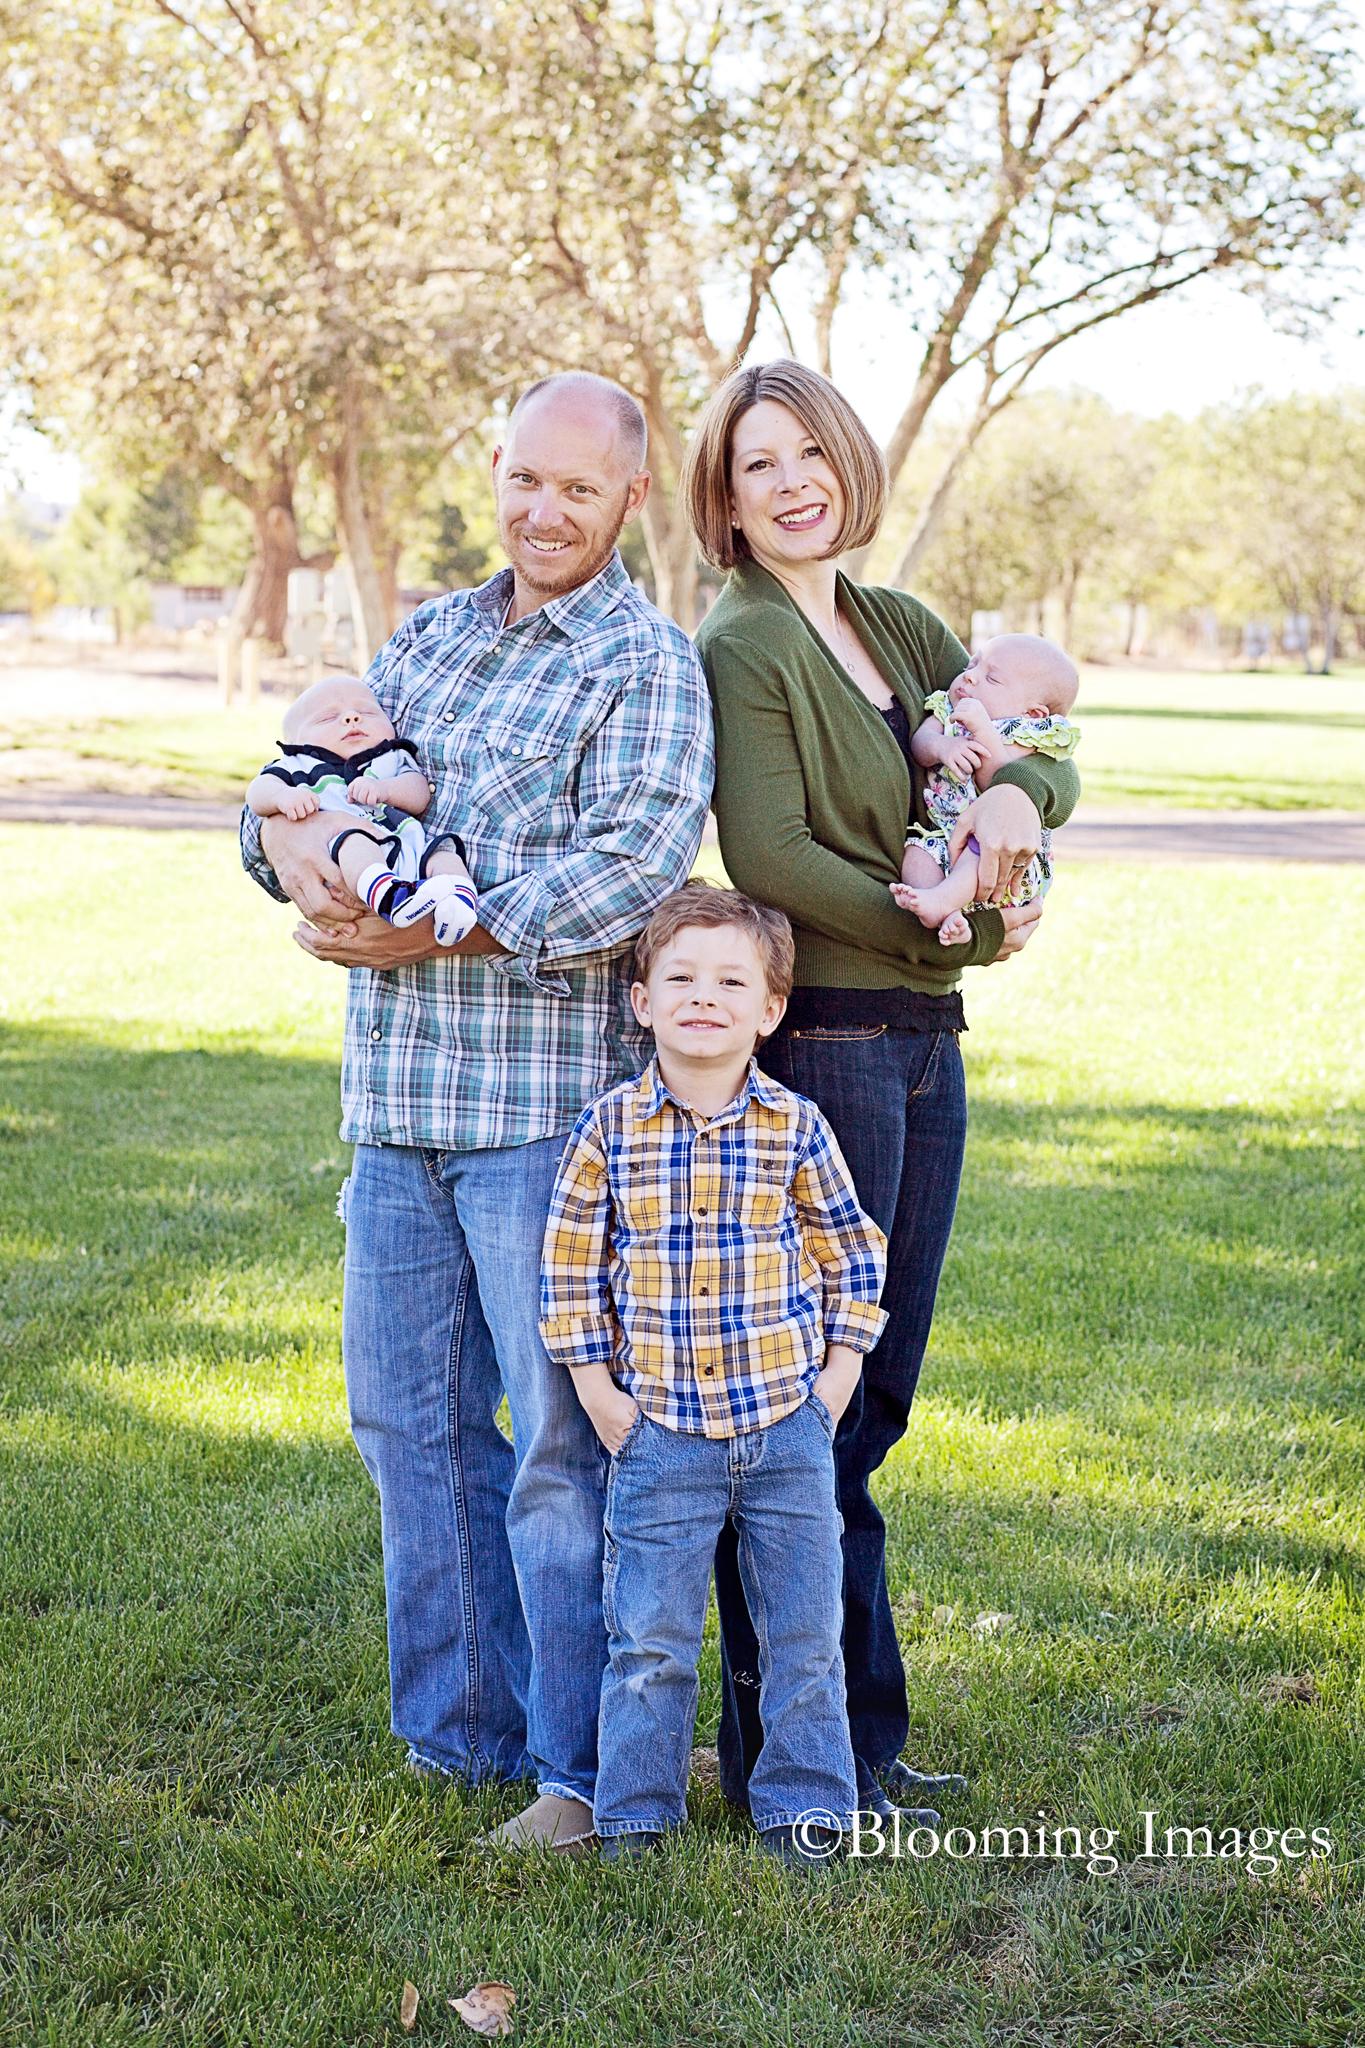 Albuquerque Family Photographers, Family Photographers in Albuquerque, Santa Fe Family Photographers